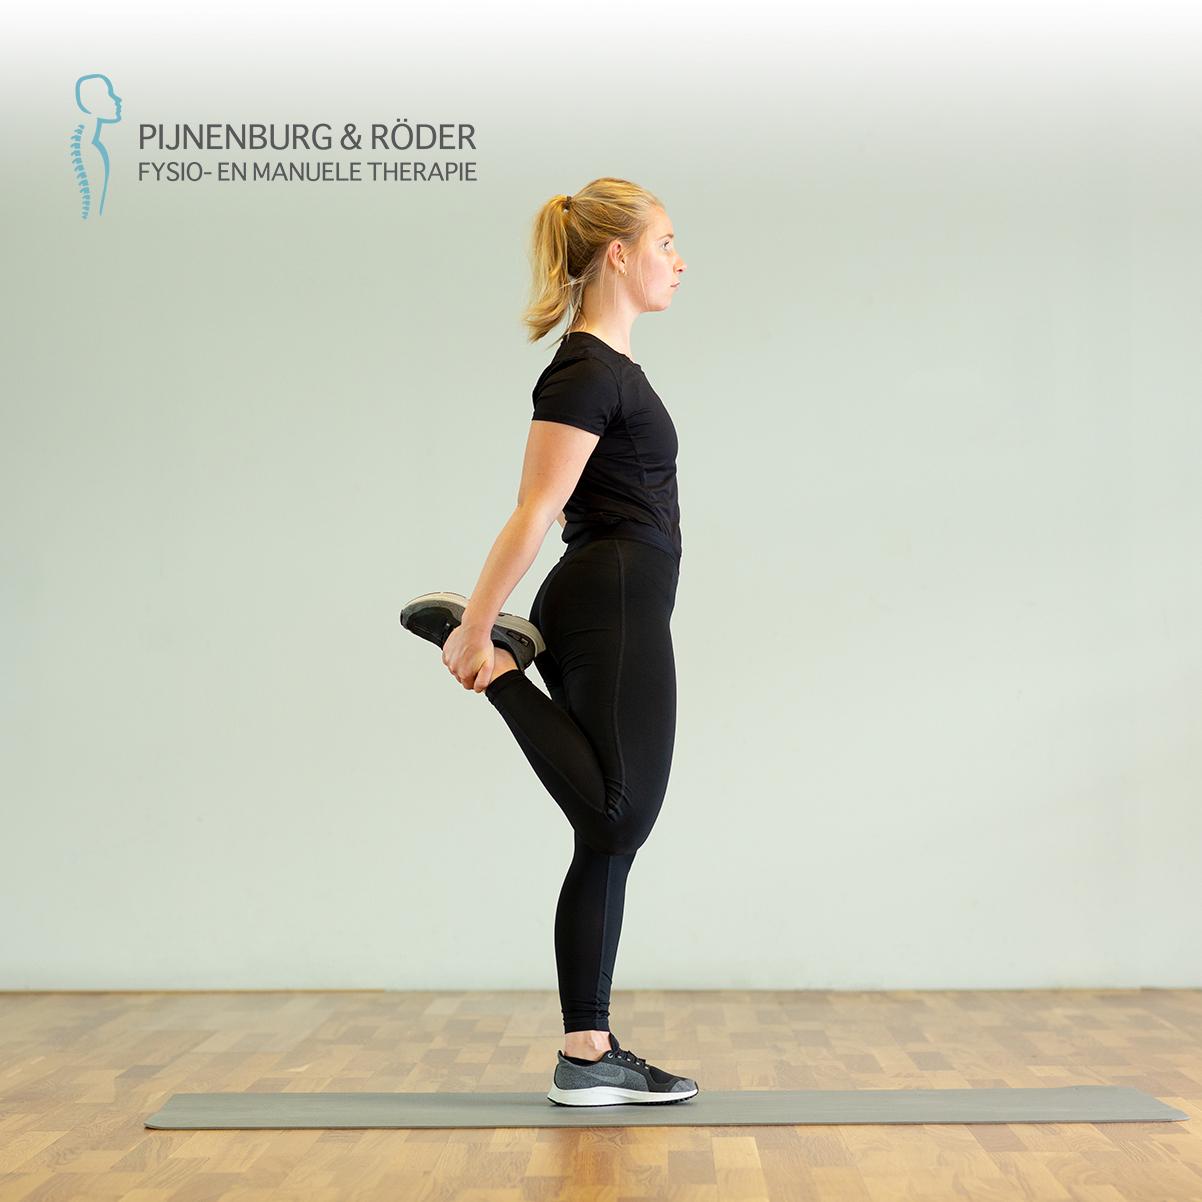 rekoefening bovenbeen quadriceps